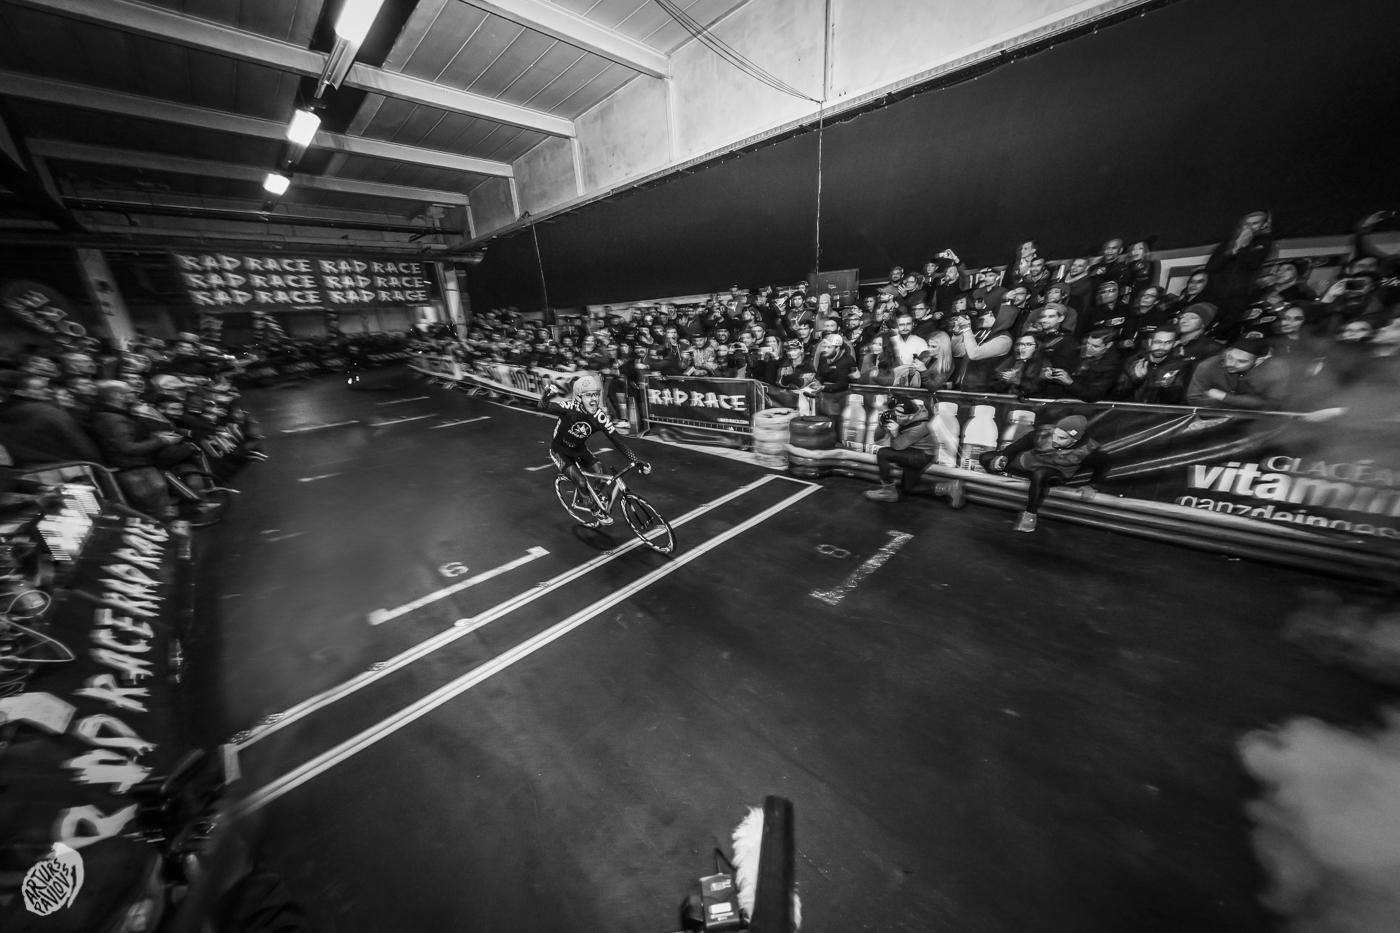 RAD RACE Last Man Standing, Berlin March 19 2016 - Shot by Arturs Pavlovs 24.jpg